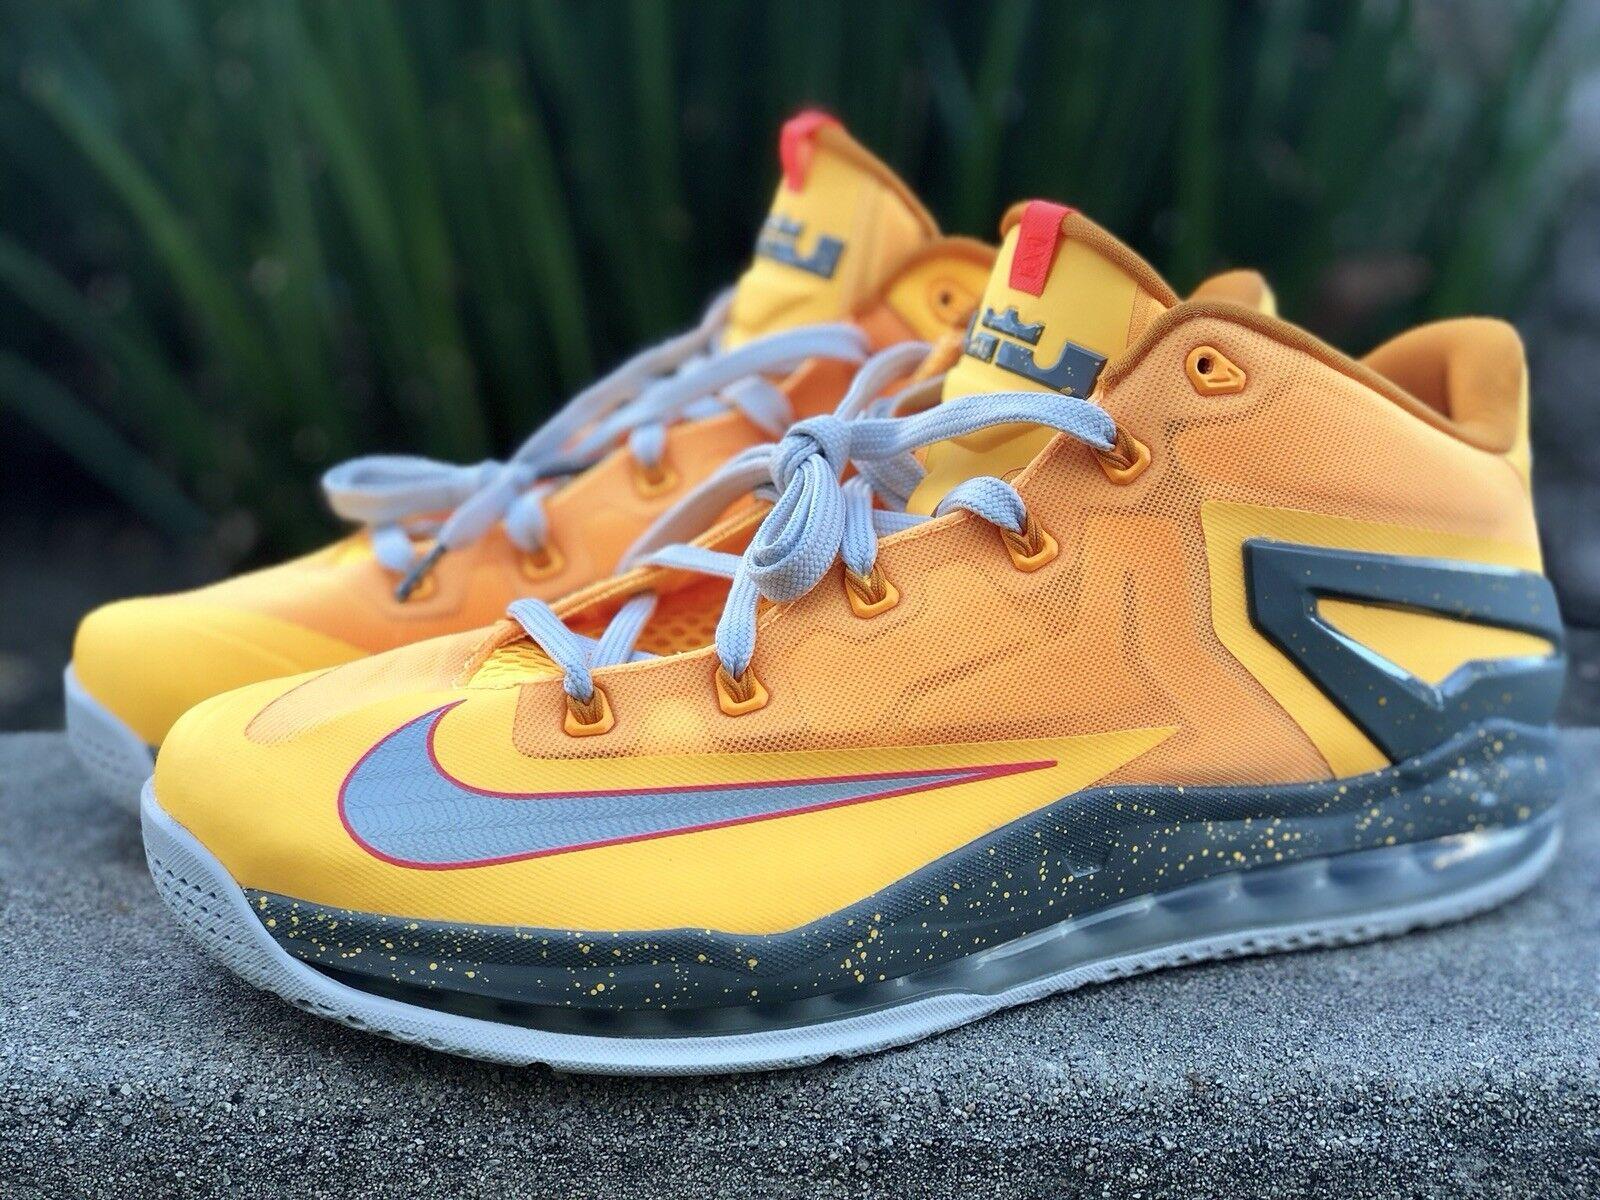 Nike LeBron 11 bajo gris los floridanos Atomic mango gris bajo Kumquat en hombre Talla 12 c5e9e5